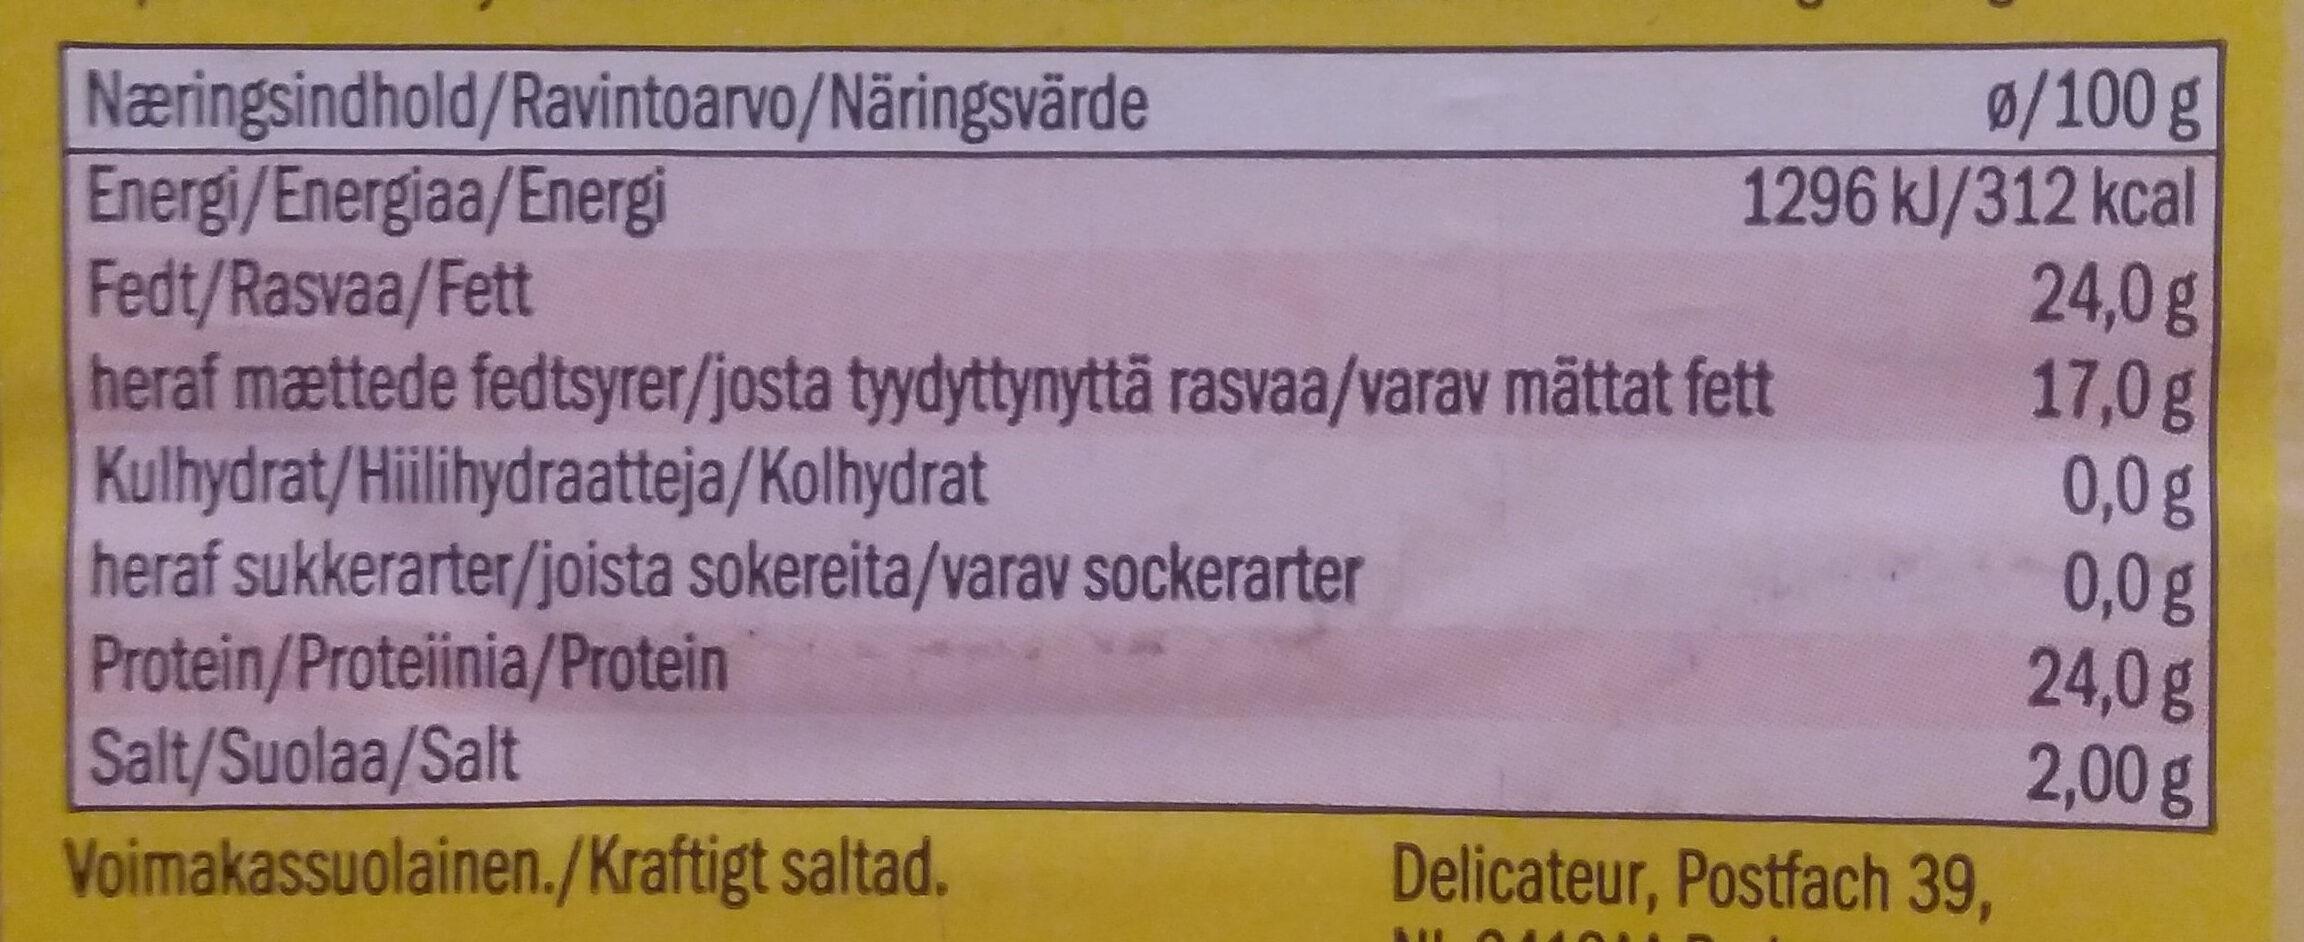 Edamer - Ravintosisältö - fi